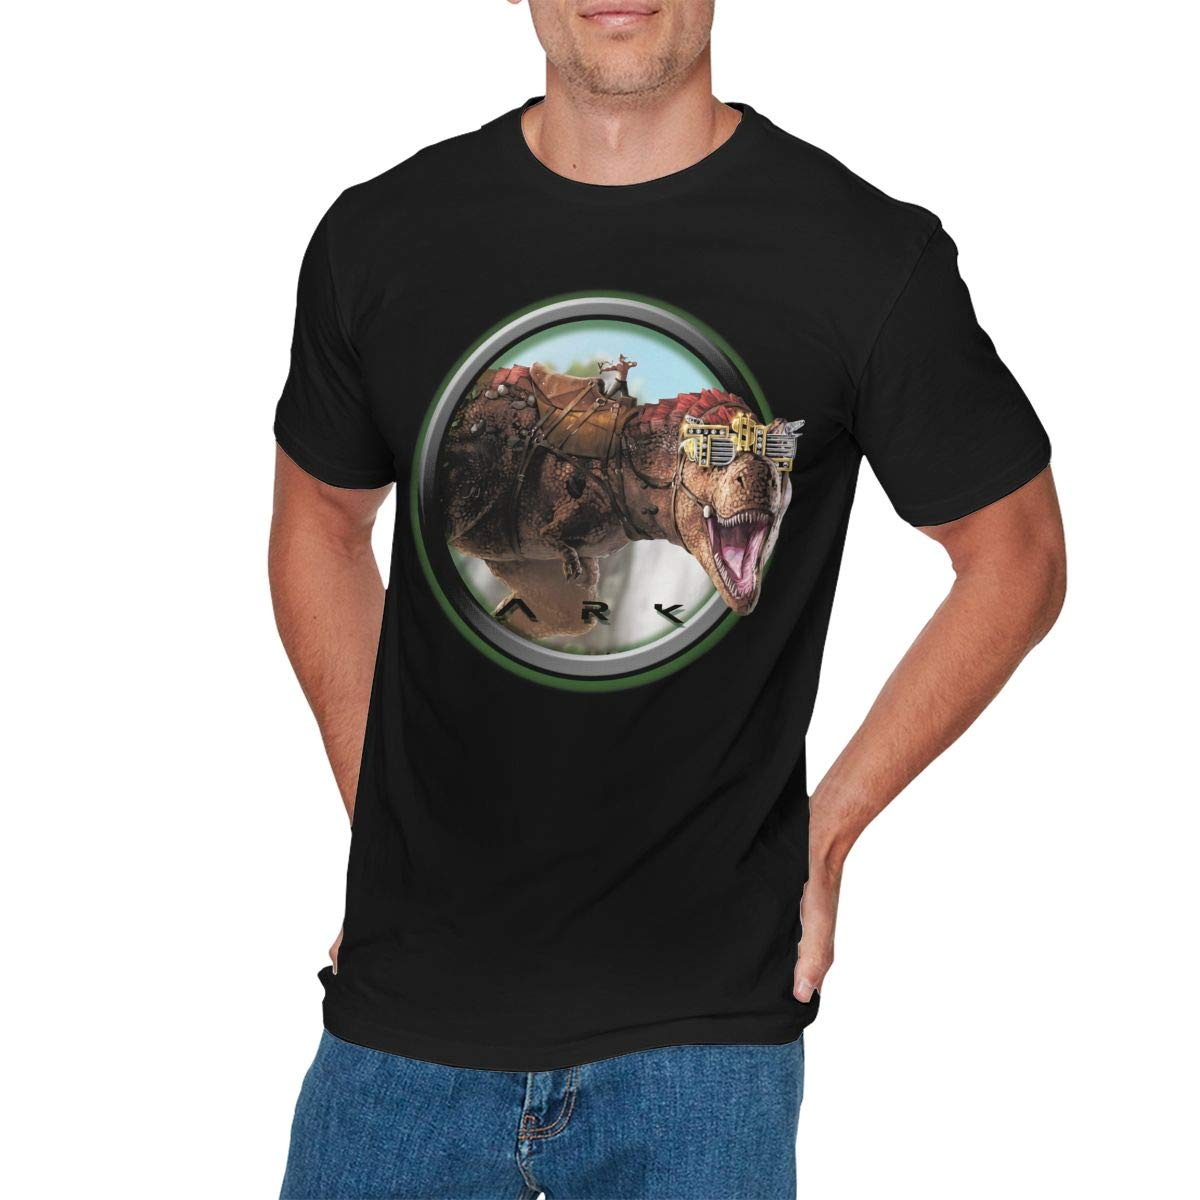 Rebecca Gould S Fashion Ark Survival Evolved Tshirt Black